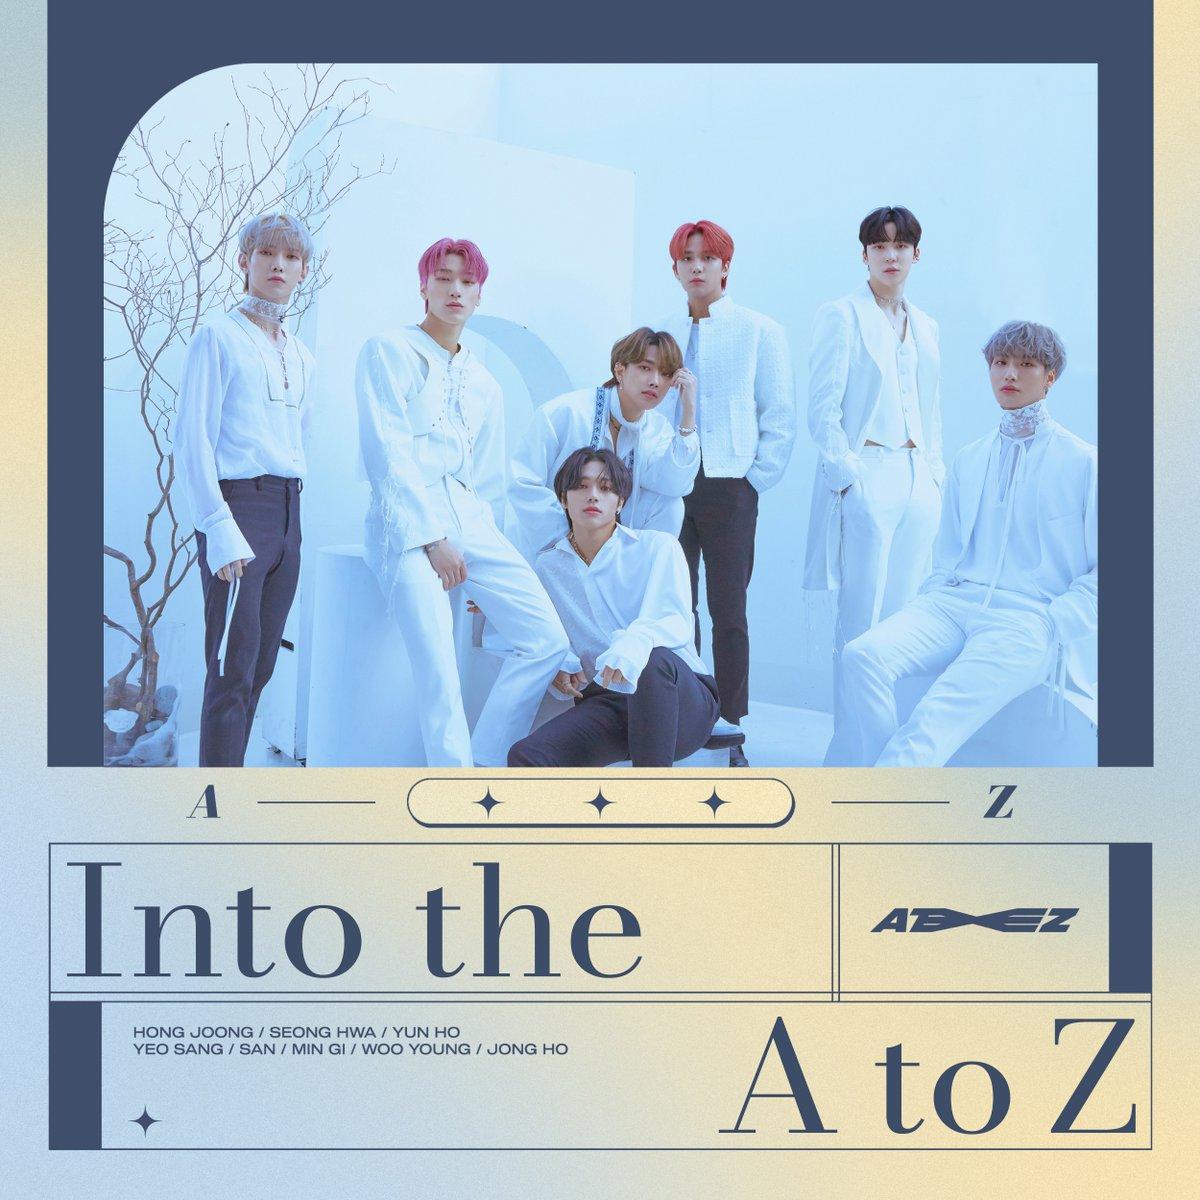 [📢] ATEEZ [Into the A to Z] ⠀ [Into the A to Z]が公開されました。 ATINYのたくさんの関心と愛をお願いします🎧🎶 ⠀   #Into_the_AtoZ  #ATEEZ #에이티즈 #エイティーズ